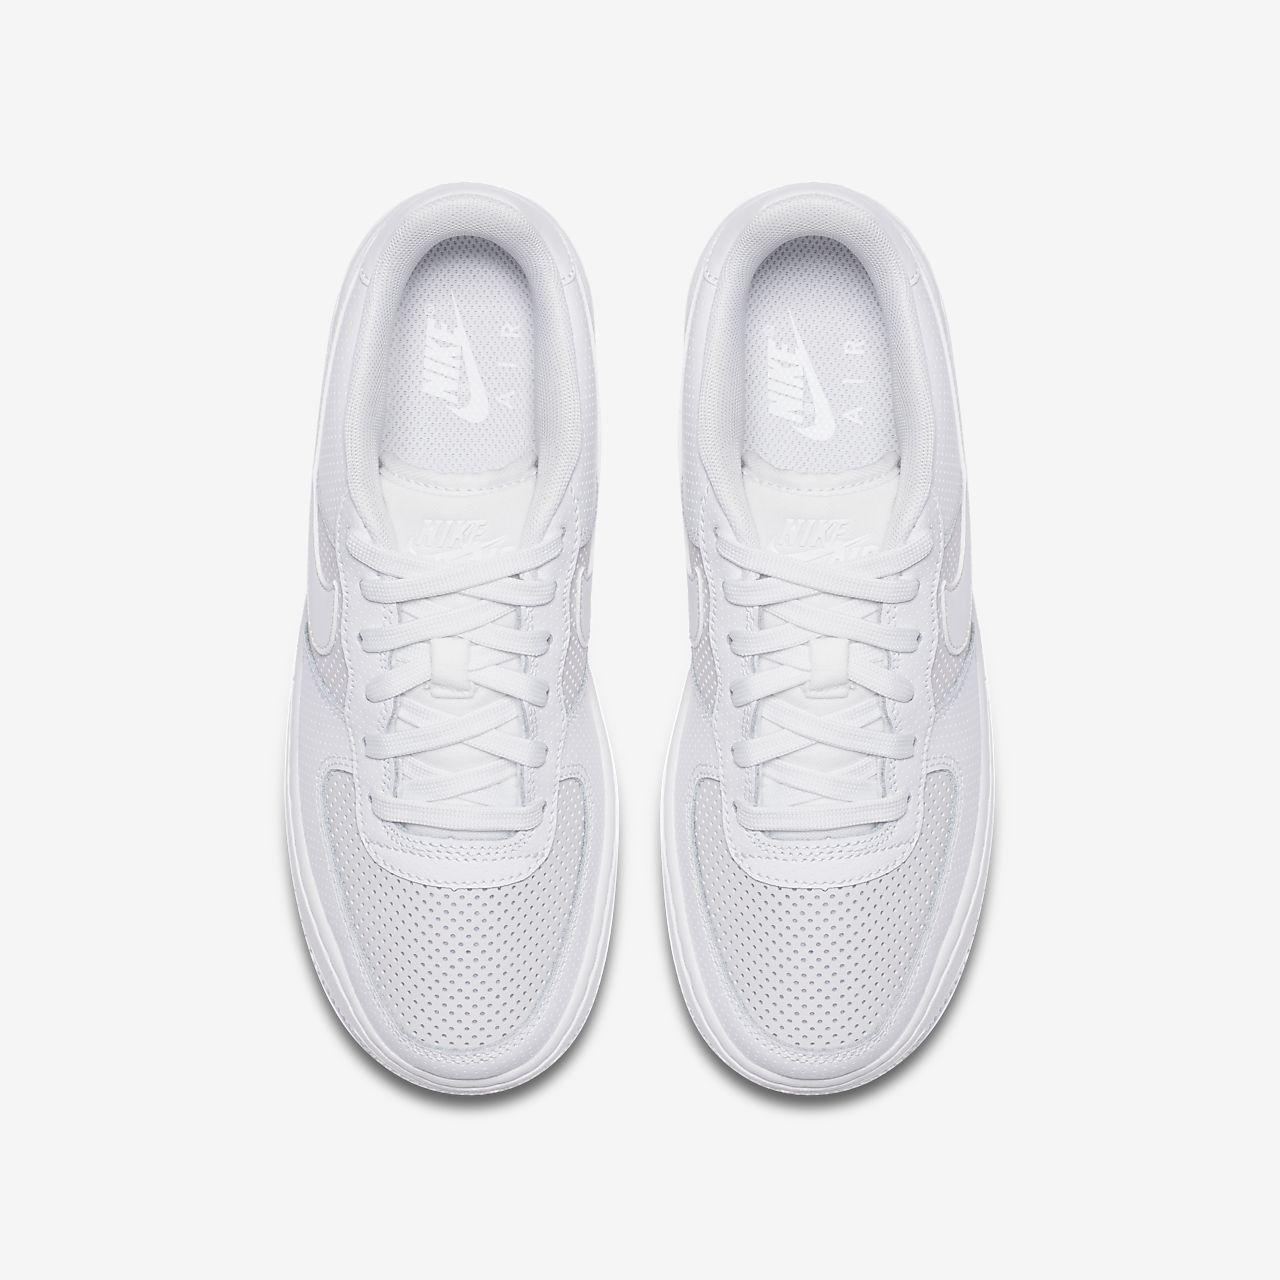 ... Nike Air Force 1 LV8 Big Kids' Shoe